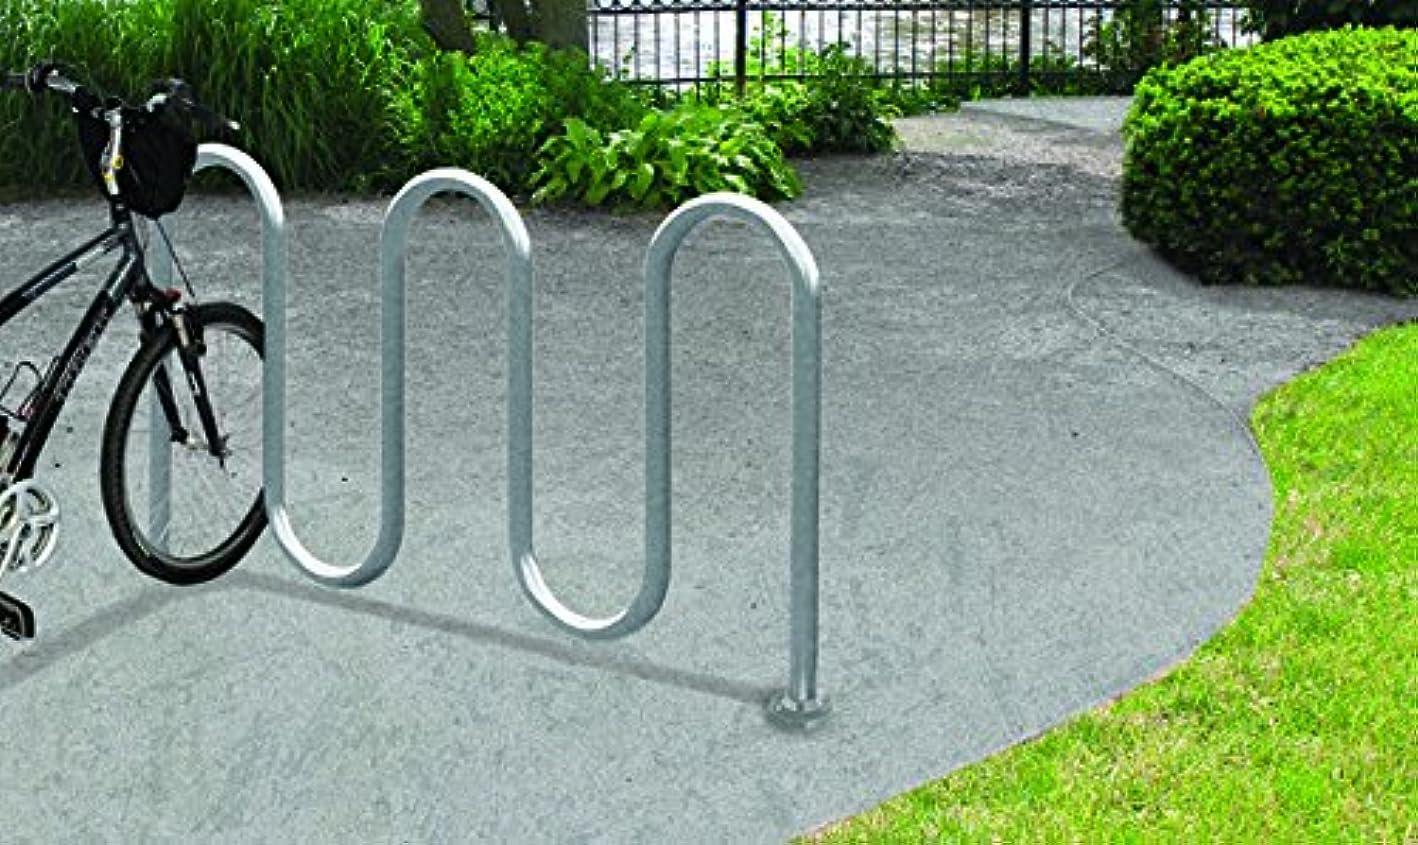 Steel Park-It Galvanized PLUS Bike Rack - Fits 7 Bikes - Surface Mount